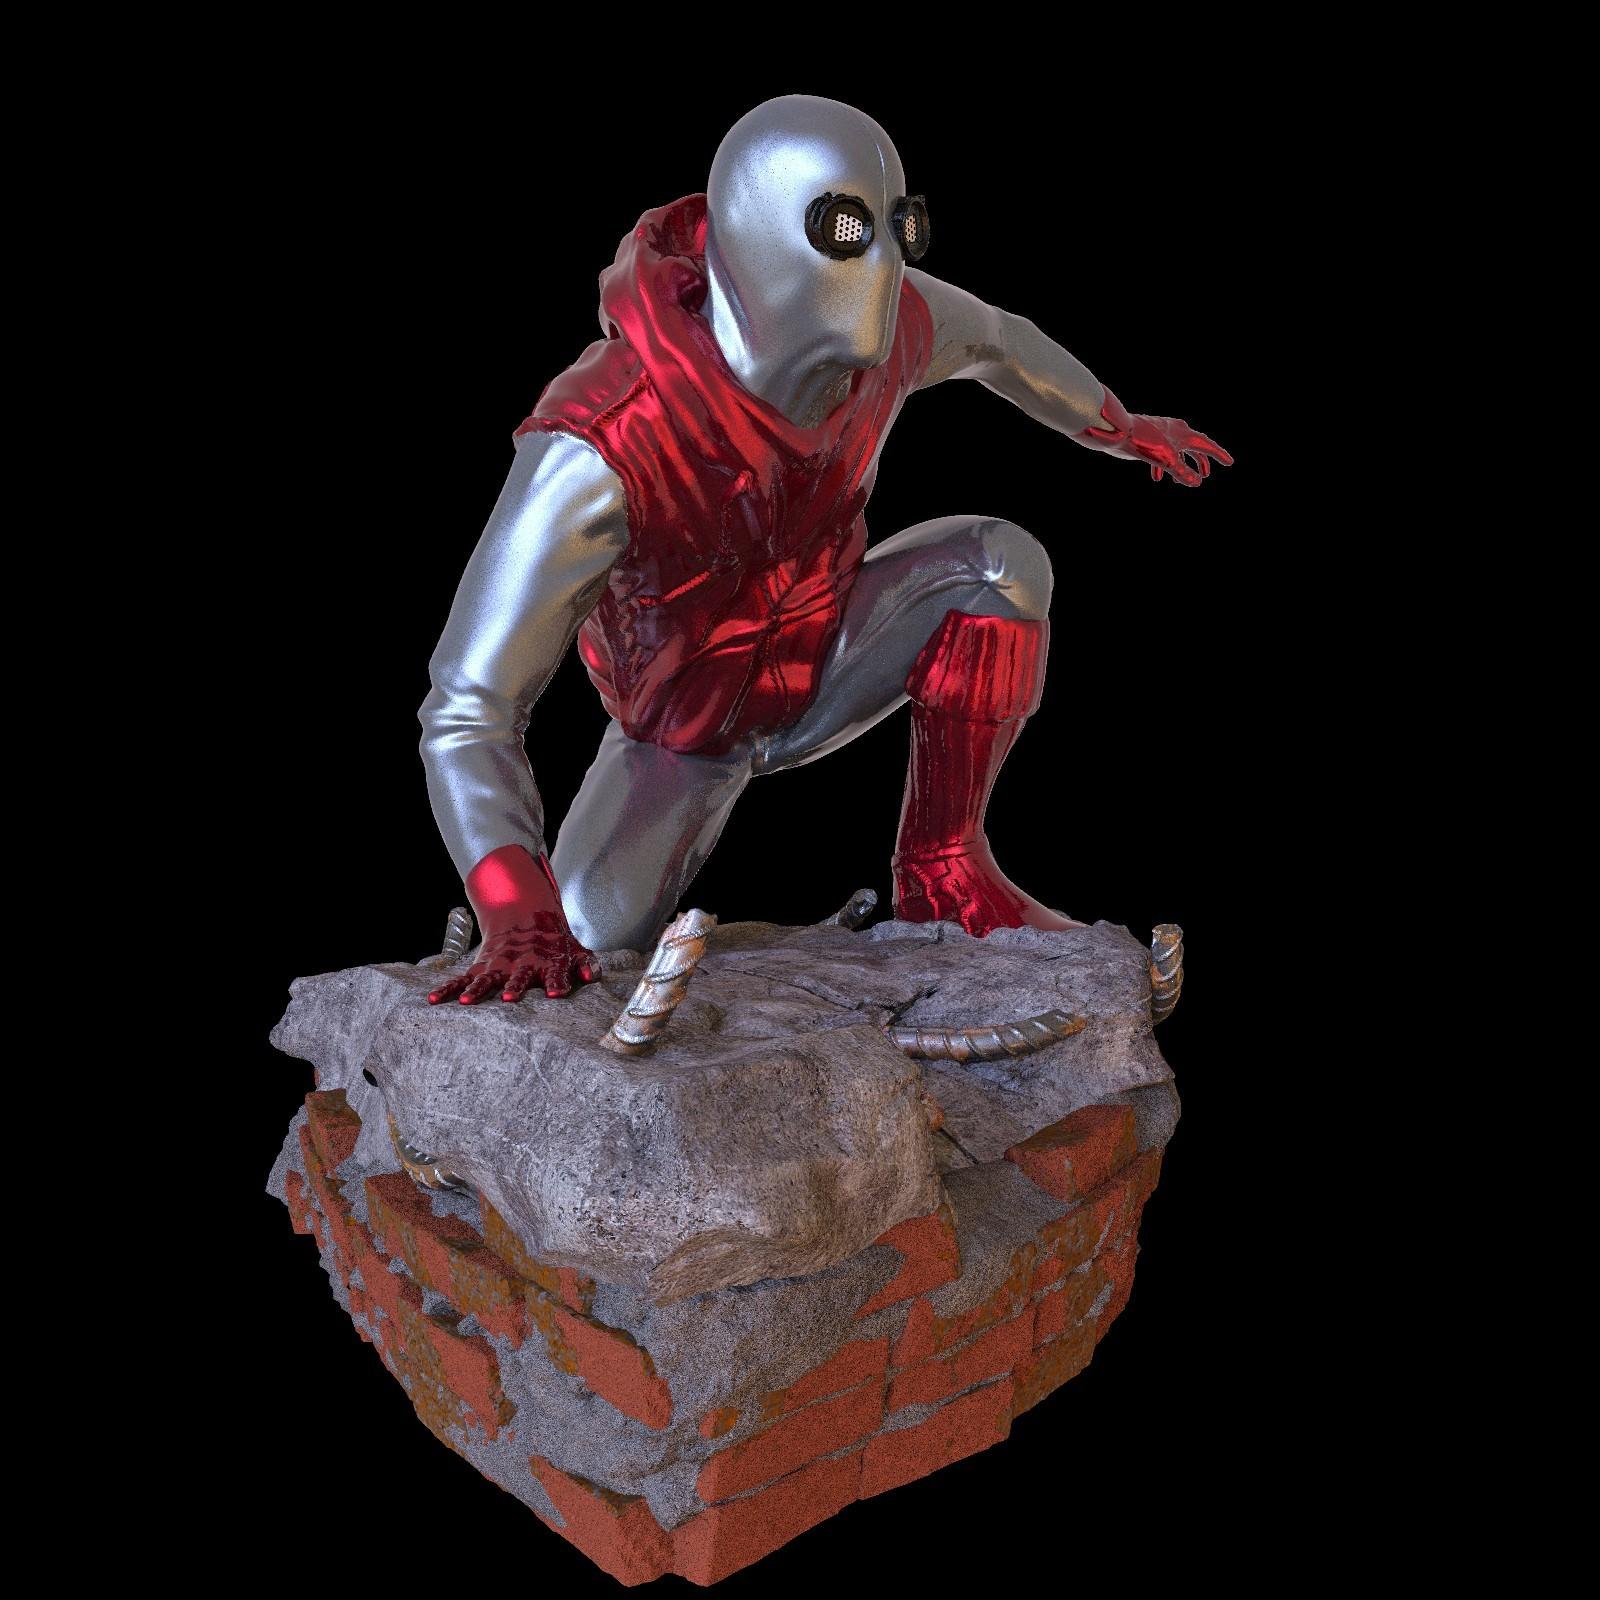 25.jpg Download STL file Spider-Man Homemade Suit • Design to 3D print, tolgaaxu